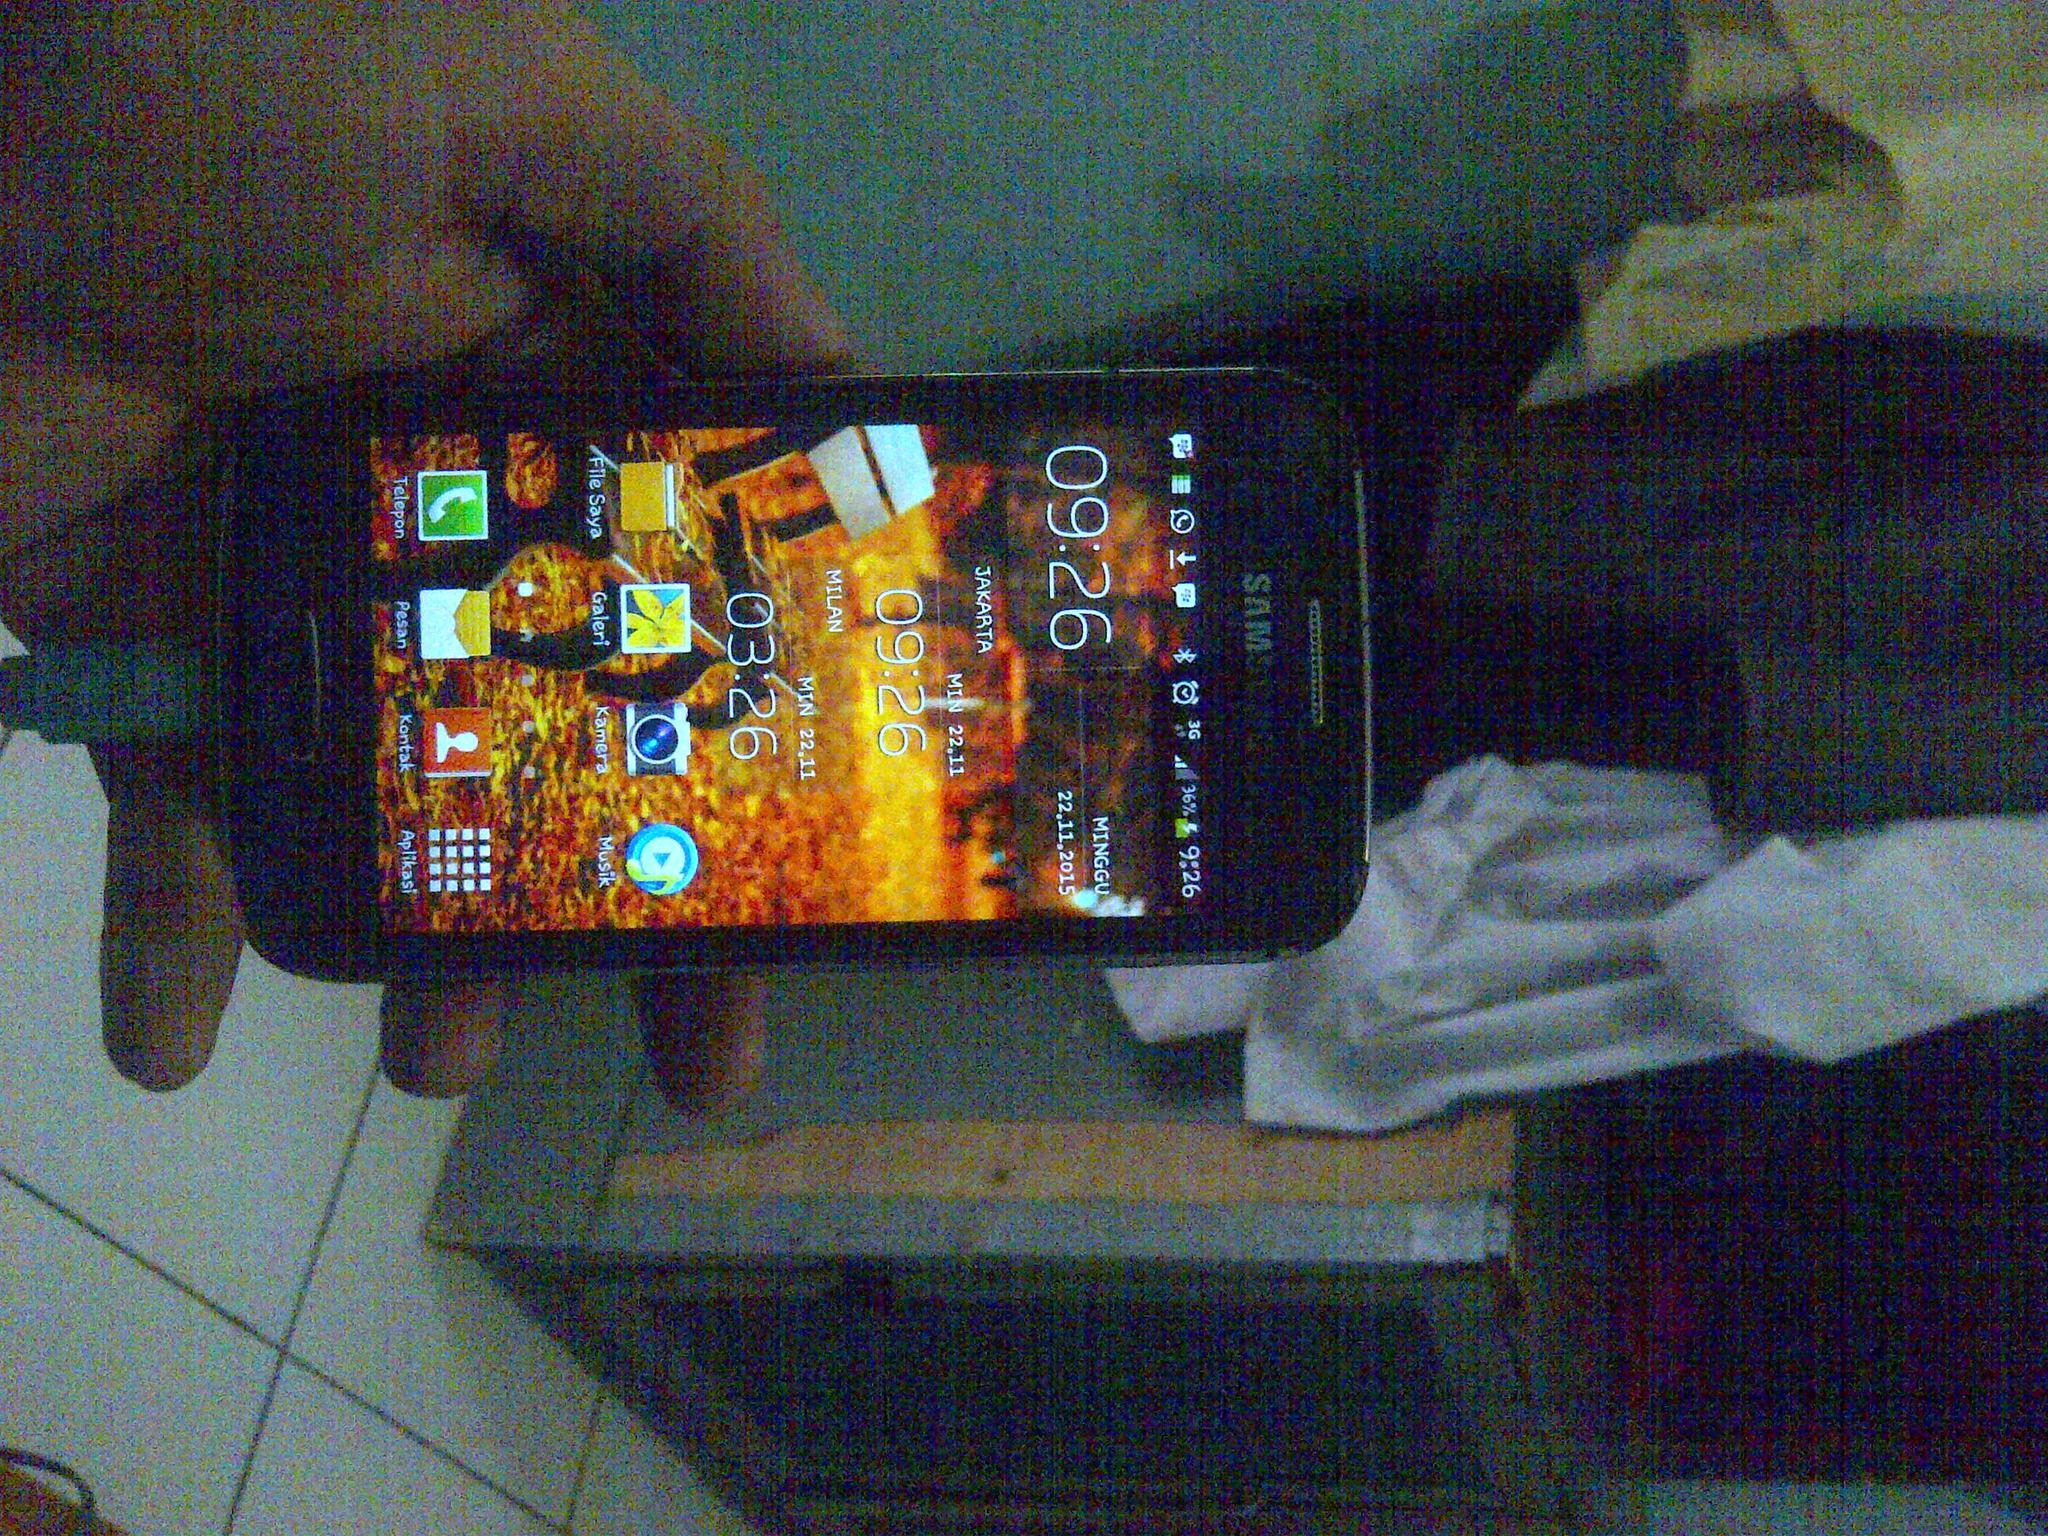 harga Samsung Galaxy Ace 3 - Bekas / Second Tokopedia.com